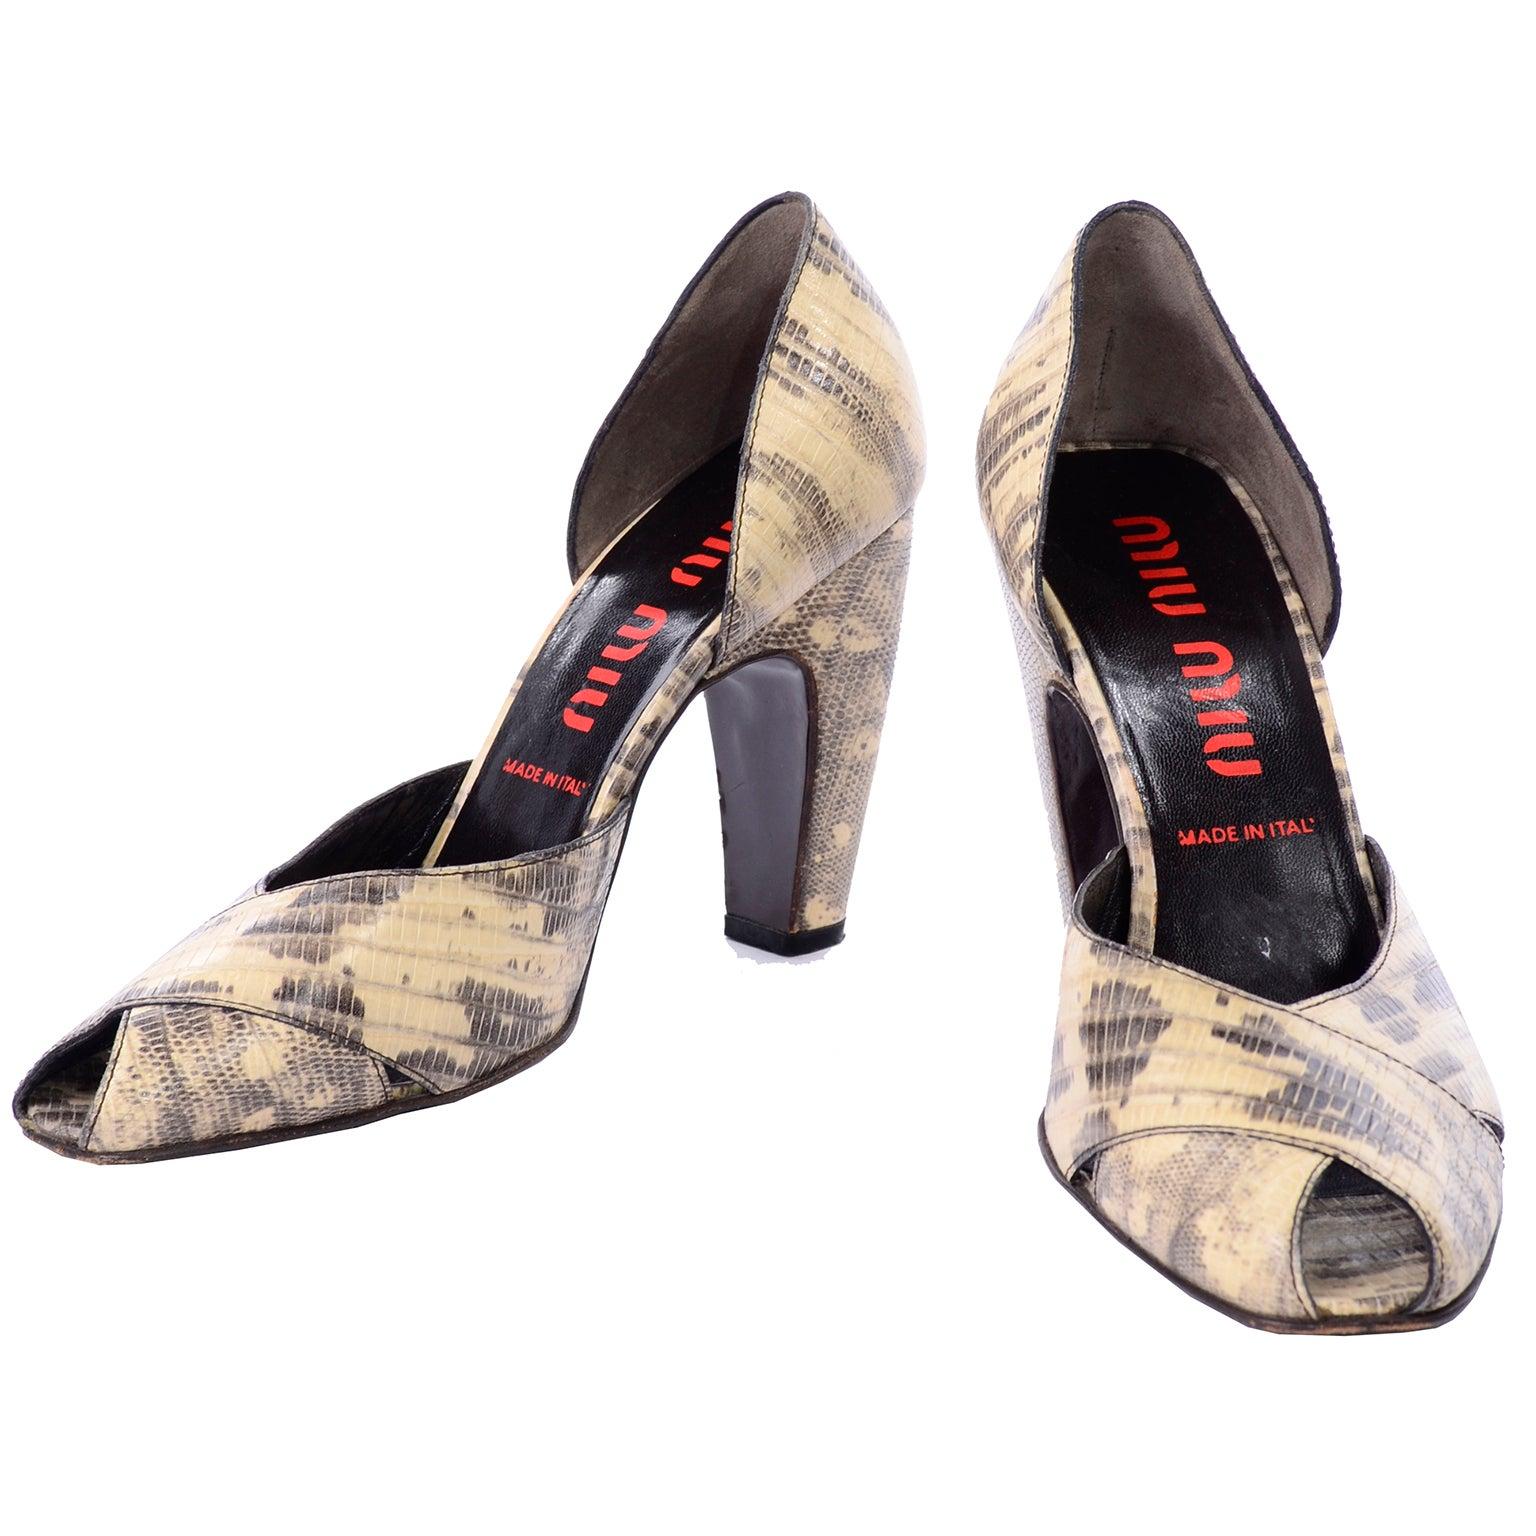 Miu Miu Python Embossed Vintage Peep Toe Shoes With Chunky Curved Heels 37.5